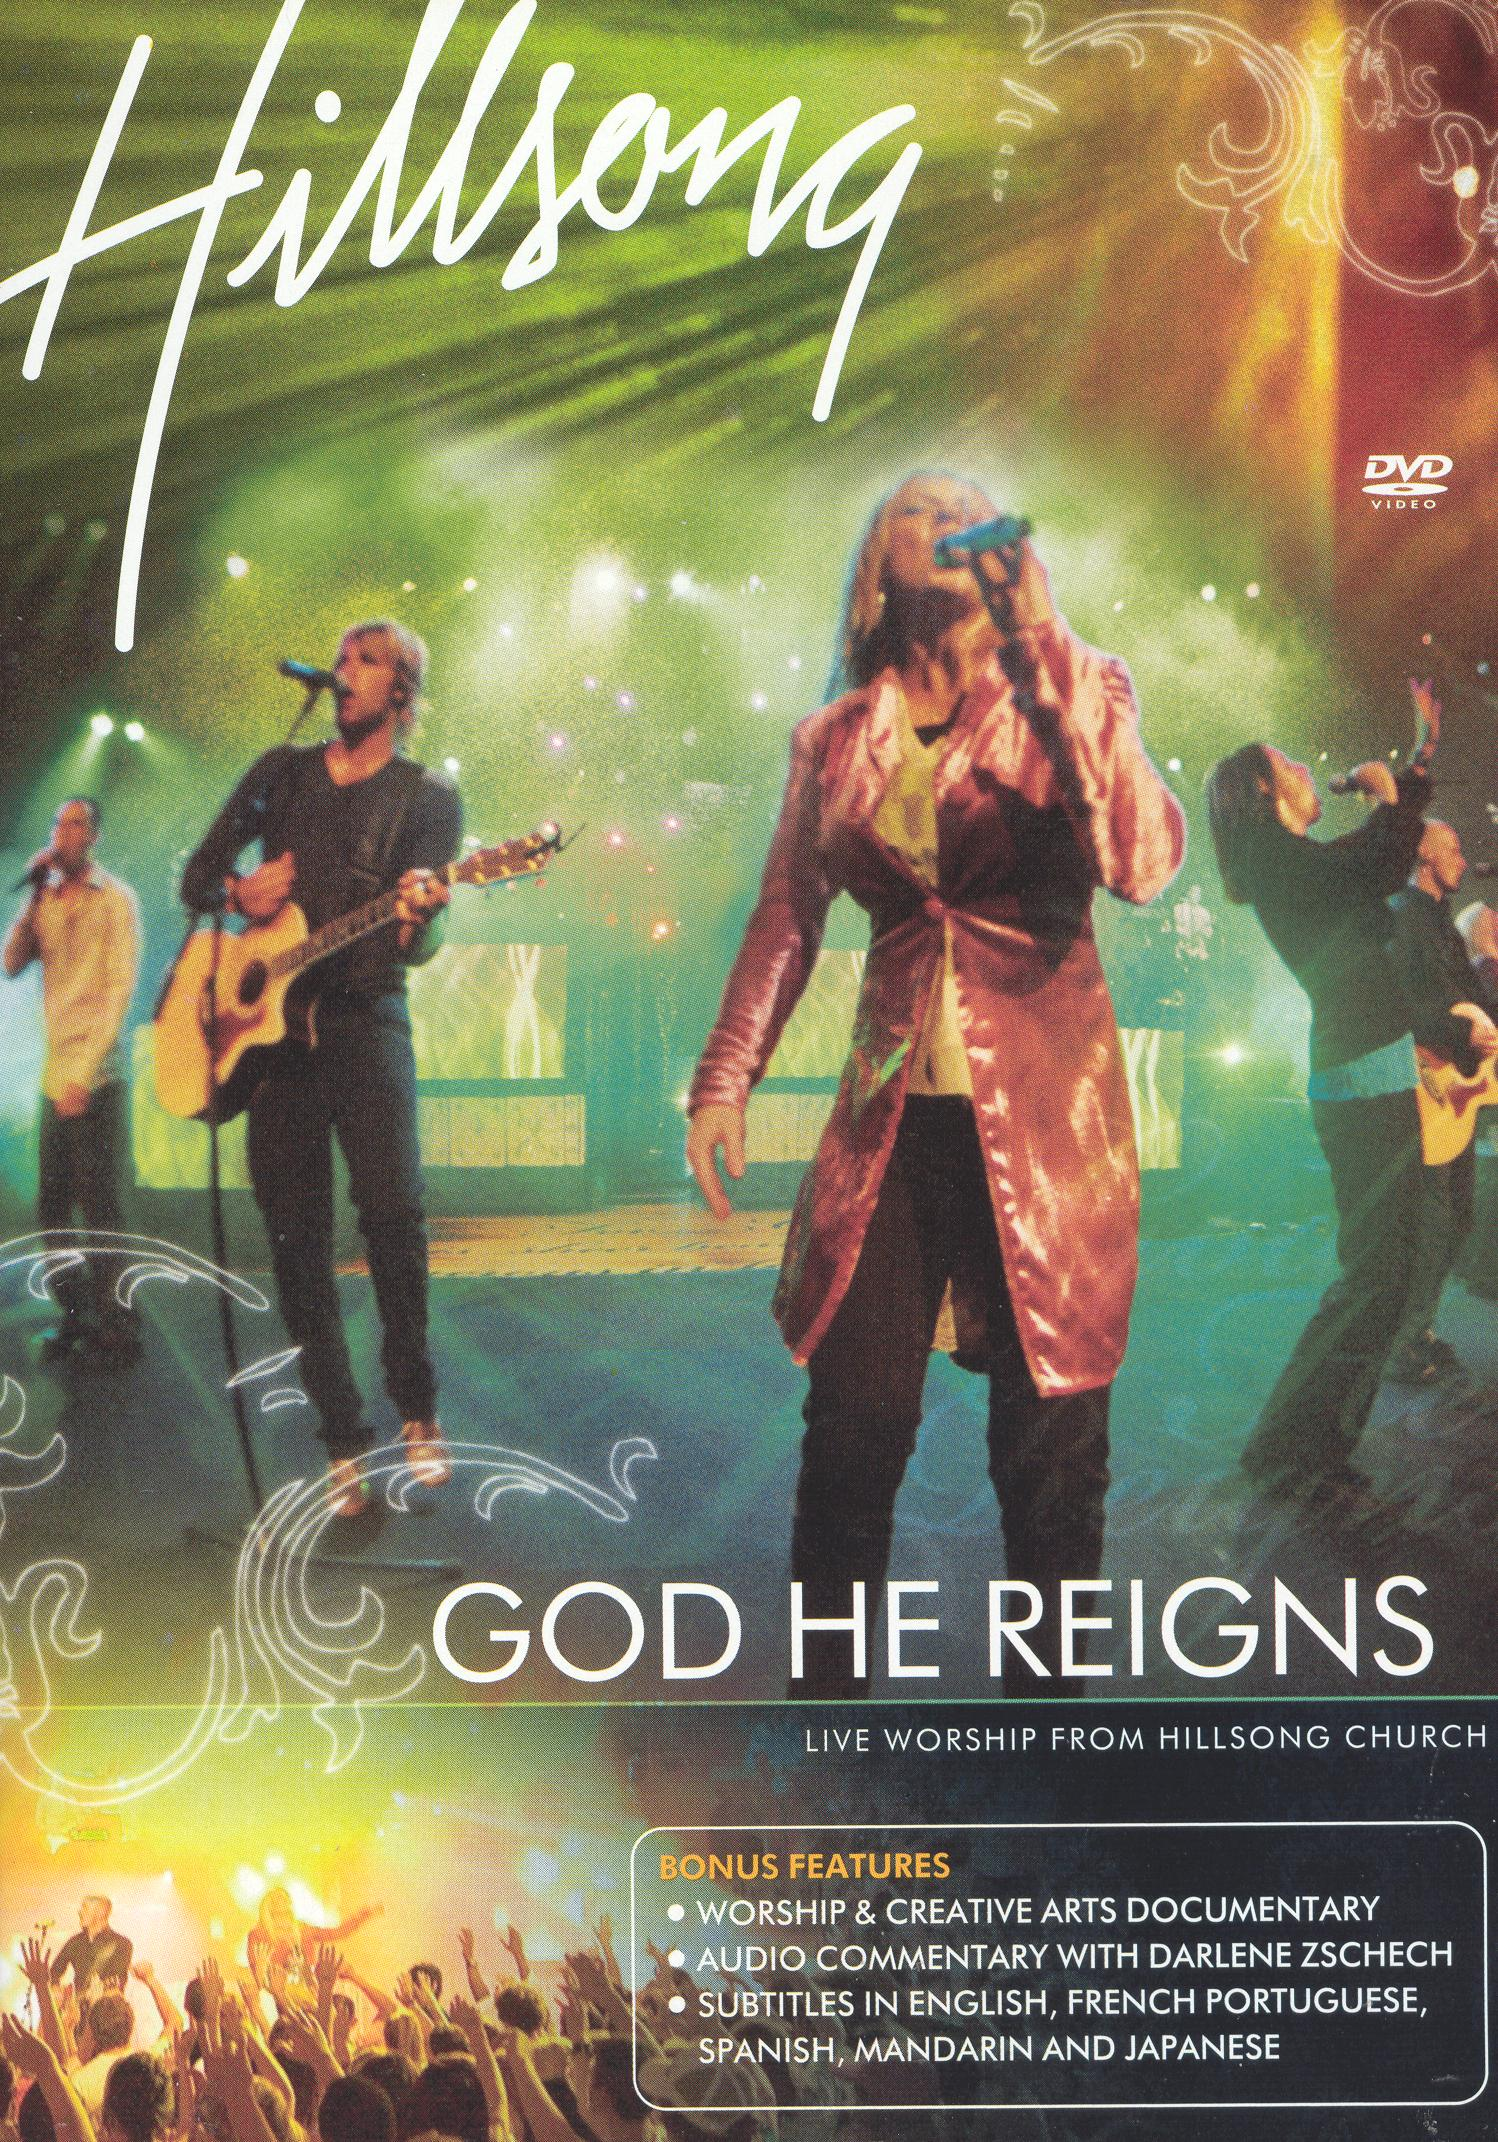 Hillsong: God He Reigns - Live Worship from Hillsong Church